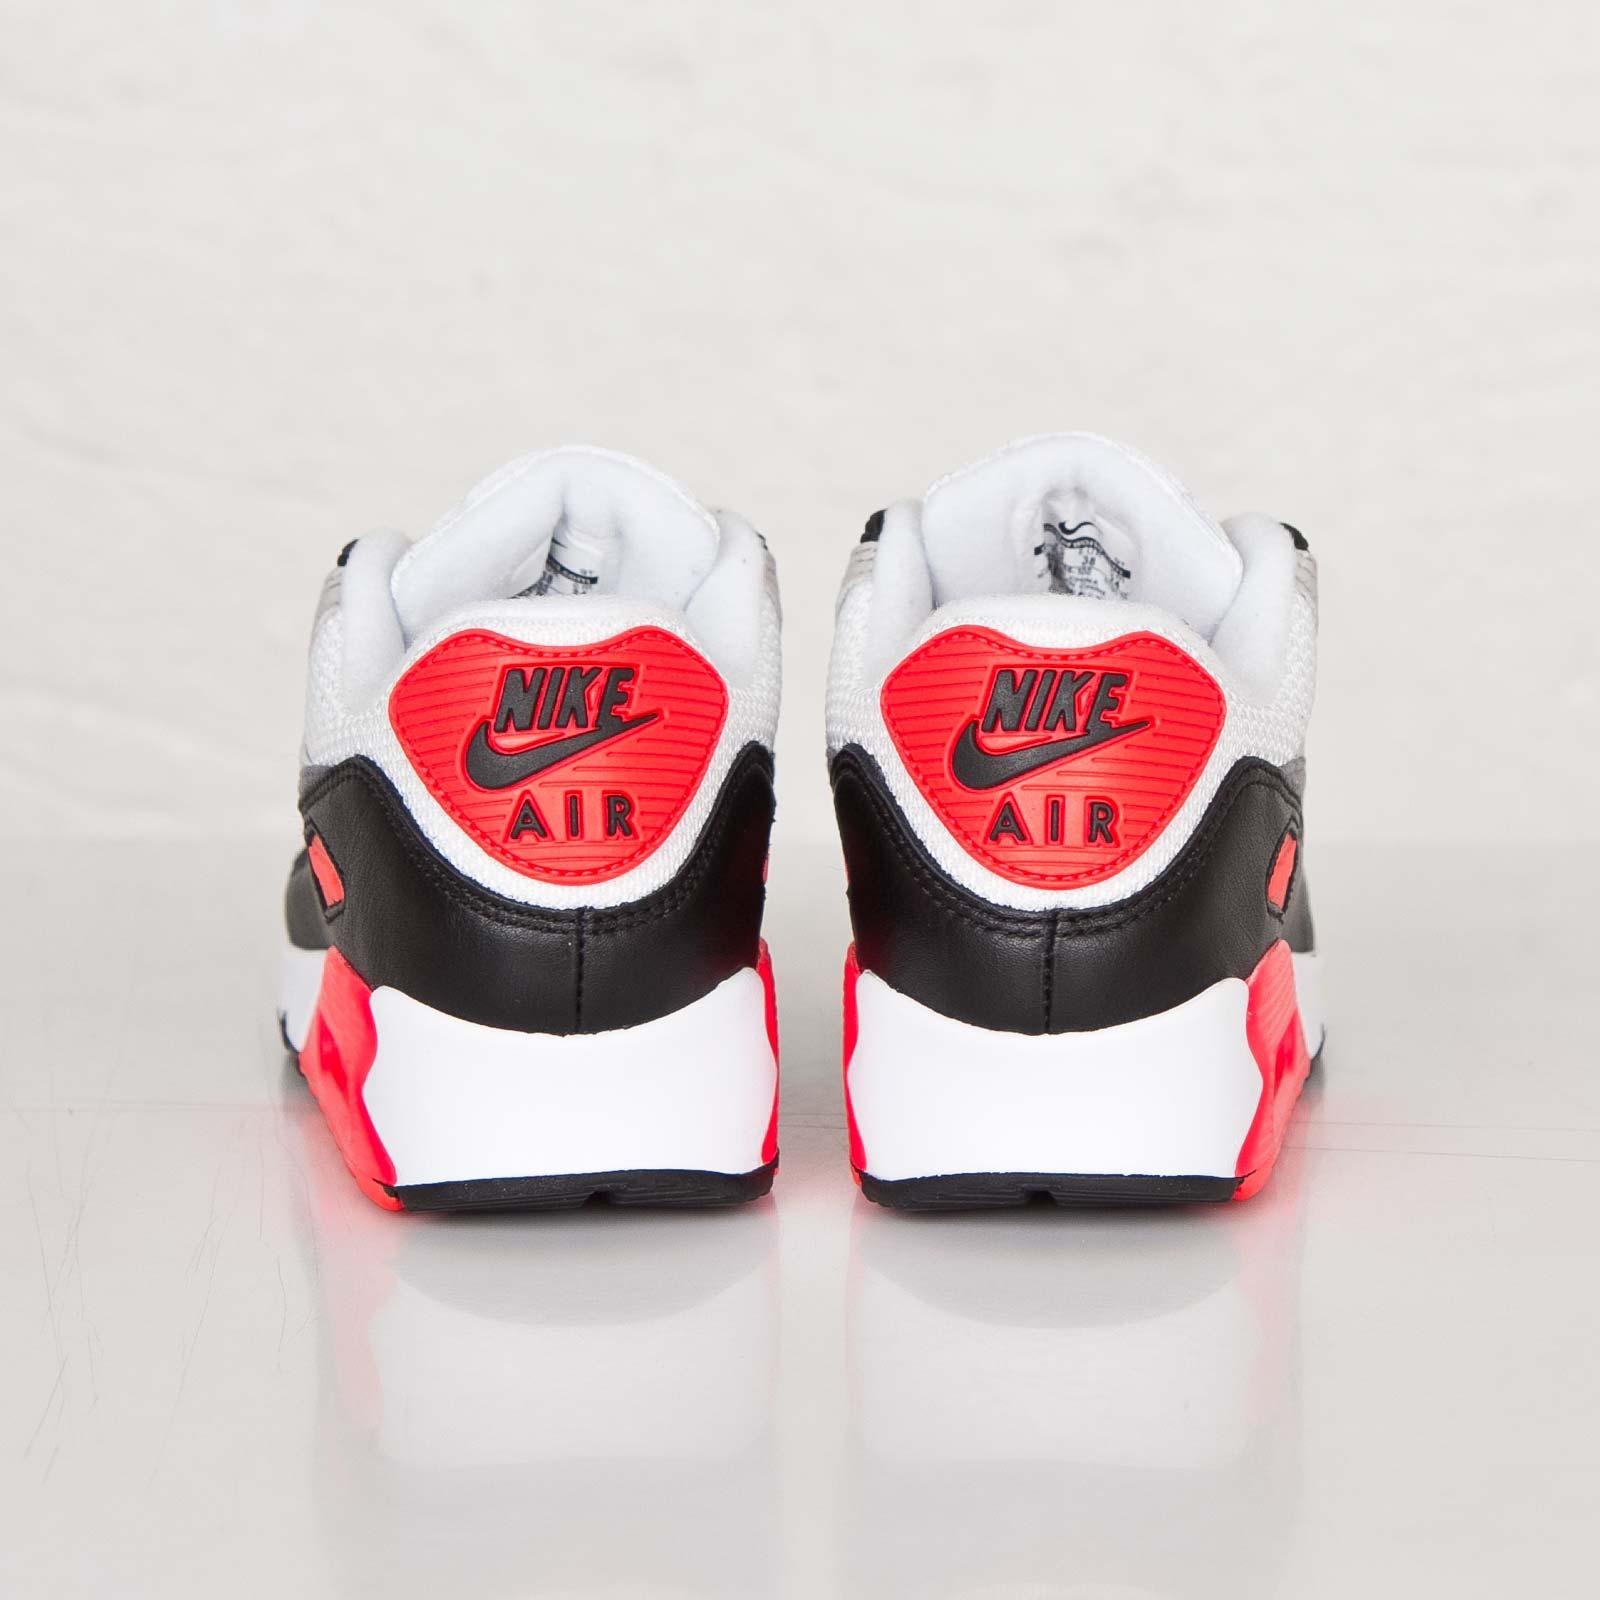 Nike WMNS Air Max 90 OG White Grey Infrared Black 742455 100 Women's Men's Sport Running Shoes Sneakers